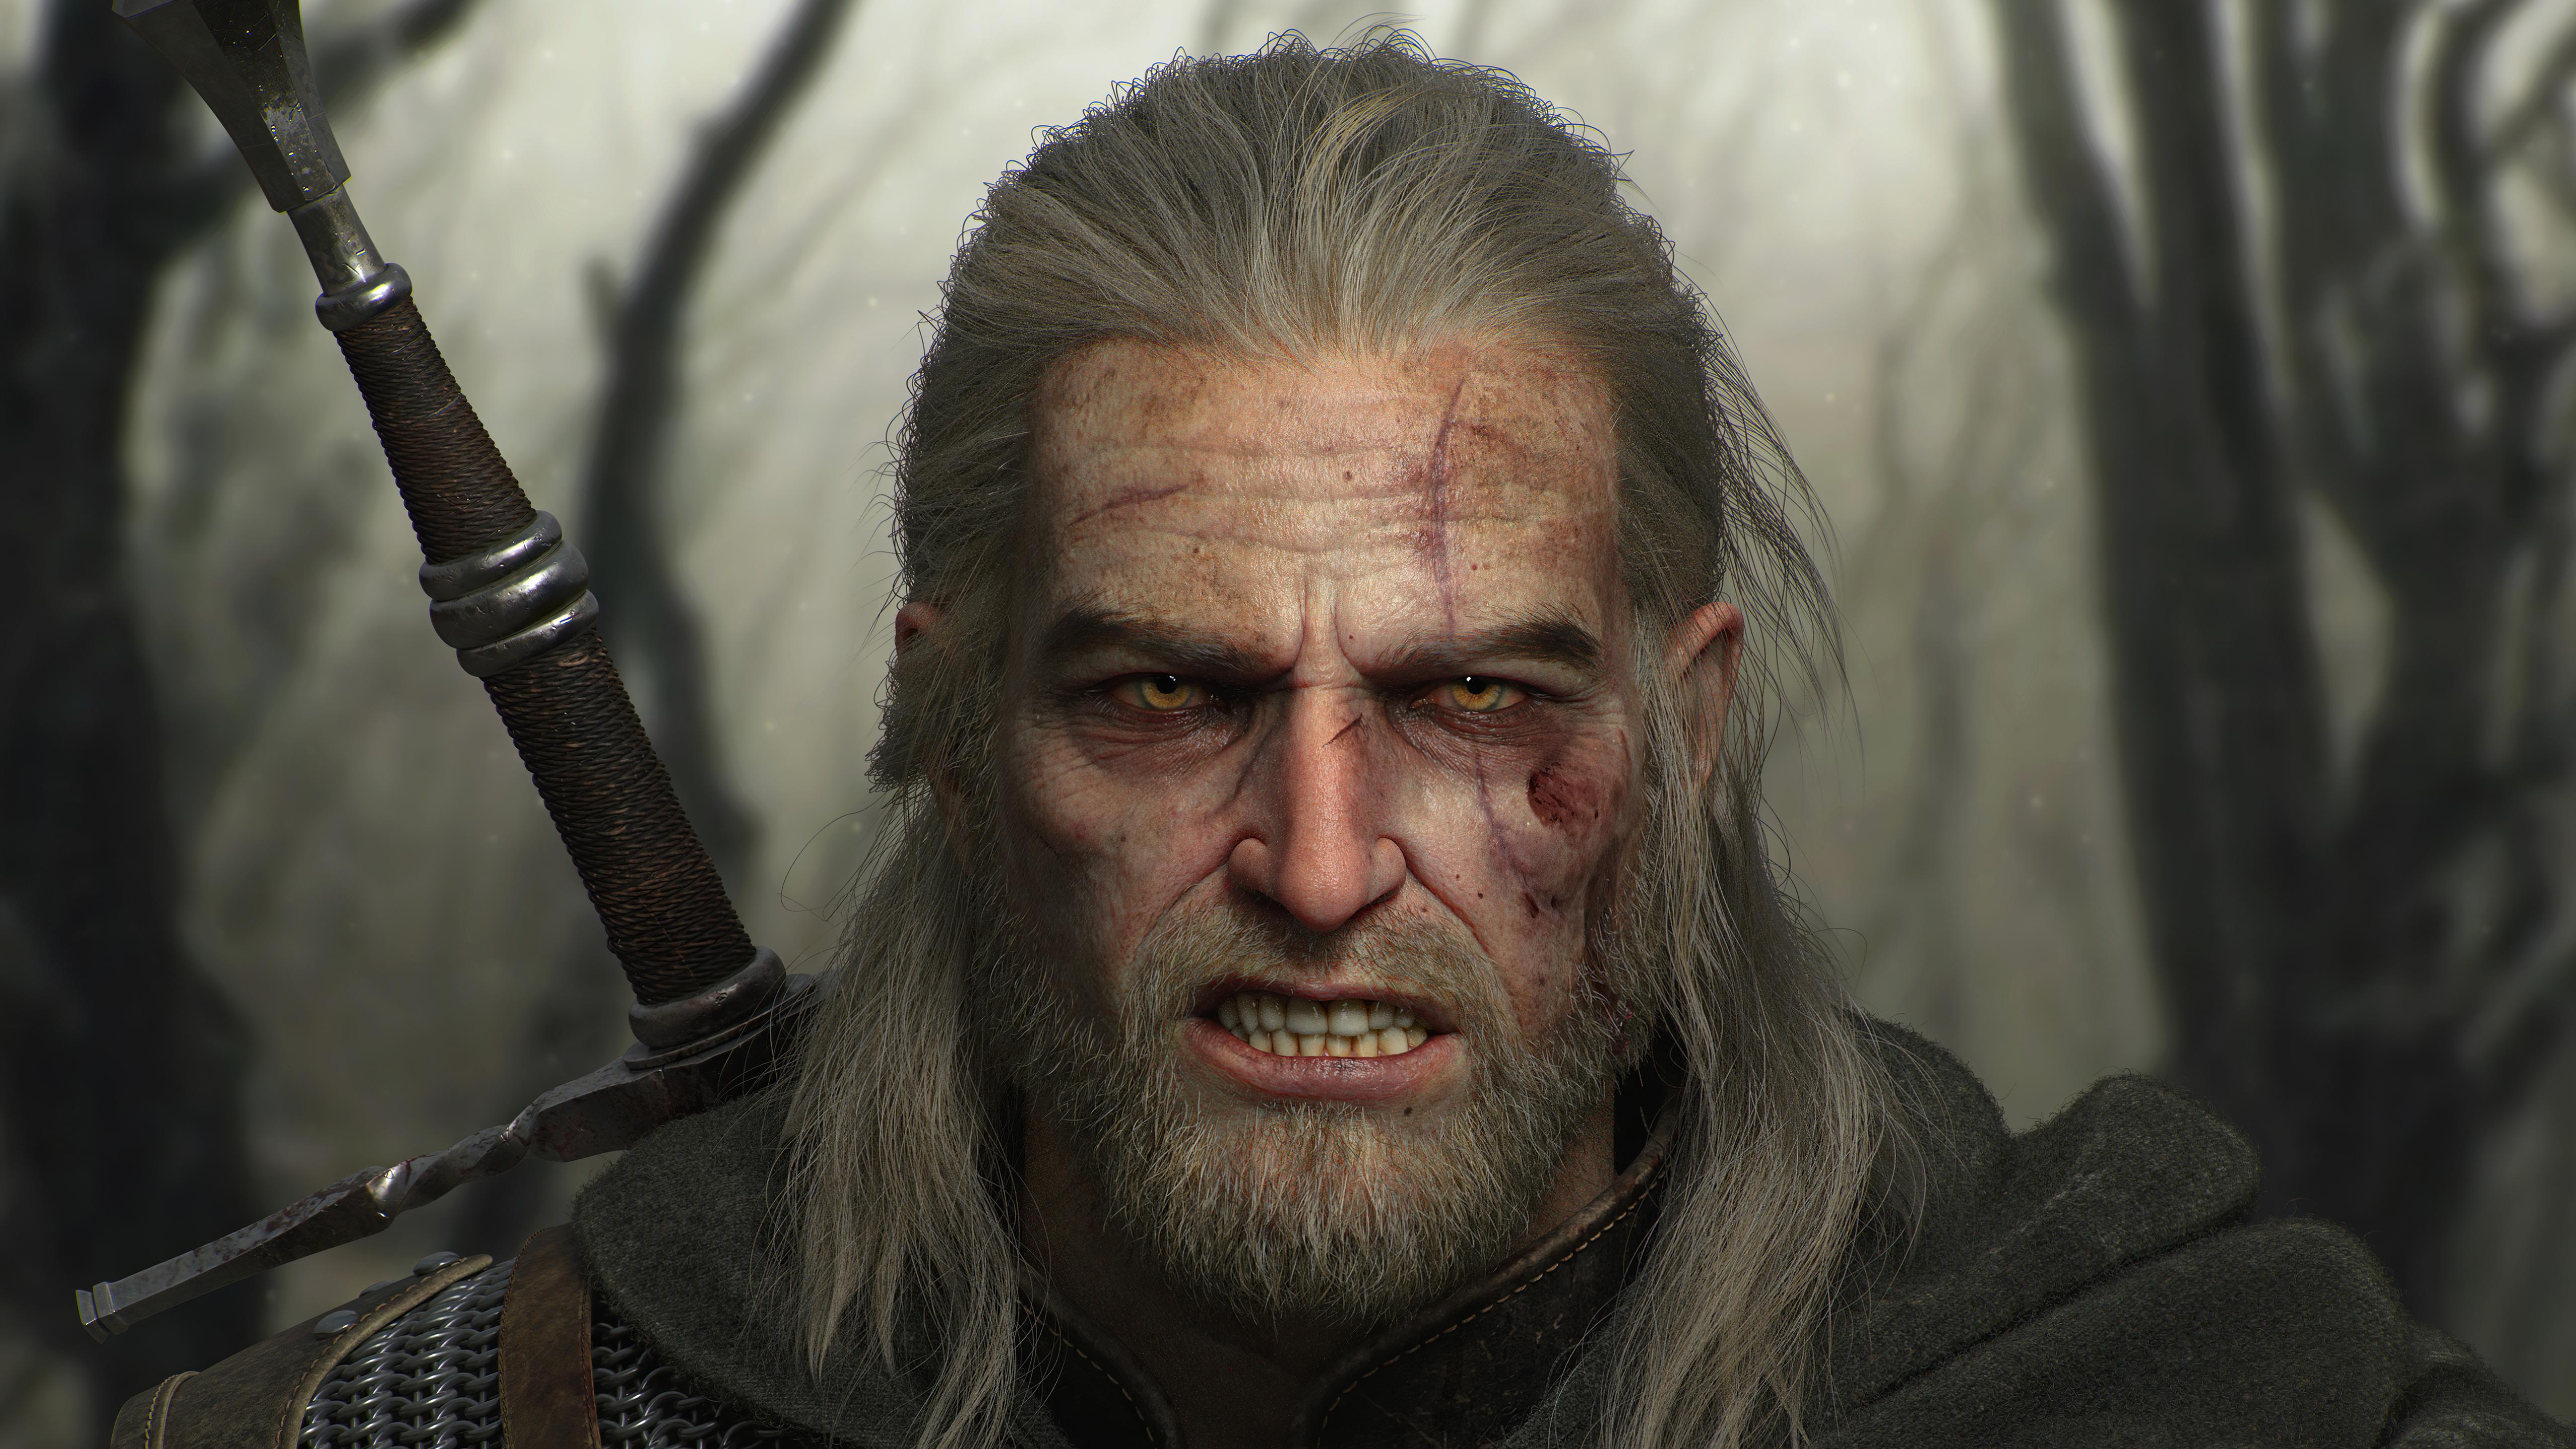 geralt of rivia the witcher 3 wild hunt 4k 1618136612 - Geralt Of Rivia The Witcher 3 Wild Hunt 4k - Geralt Of Rivia The Witcher 3 Wild Hunt 4k wallpapers